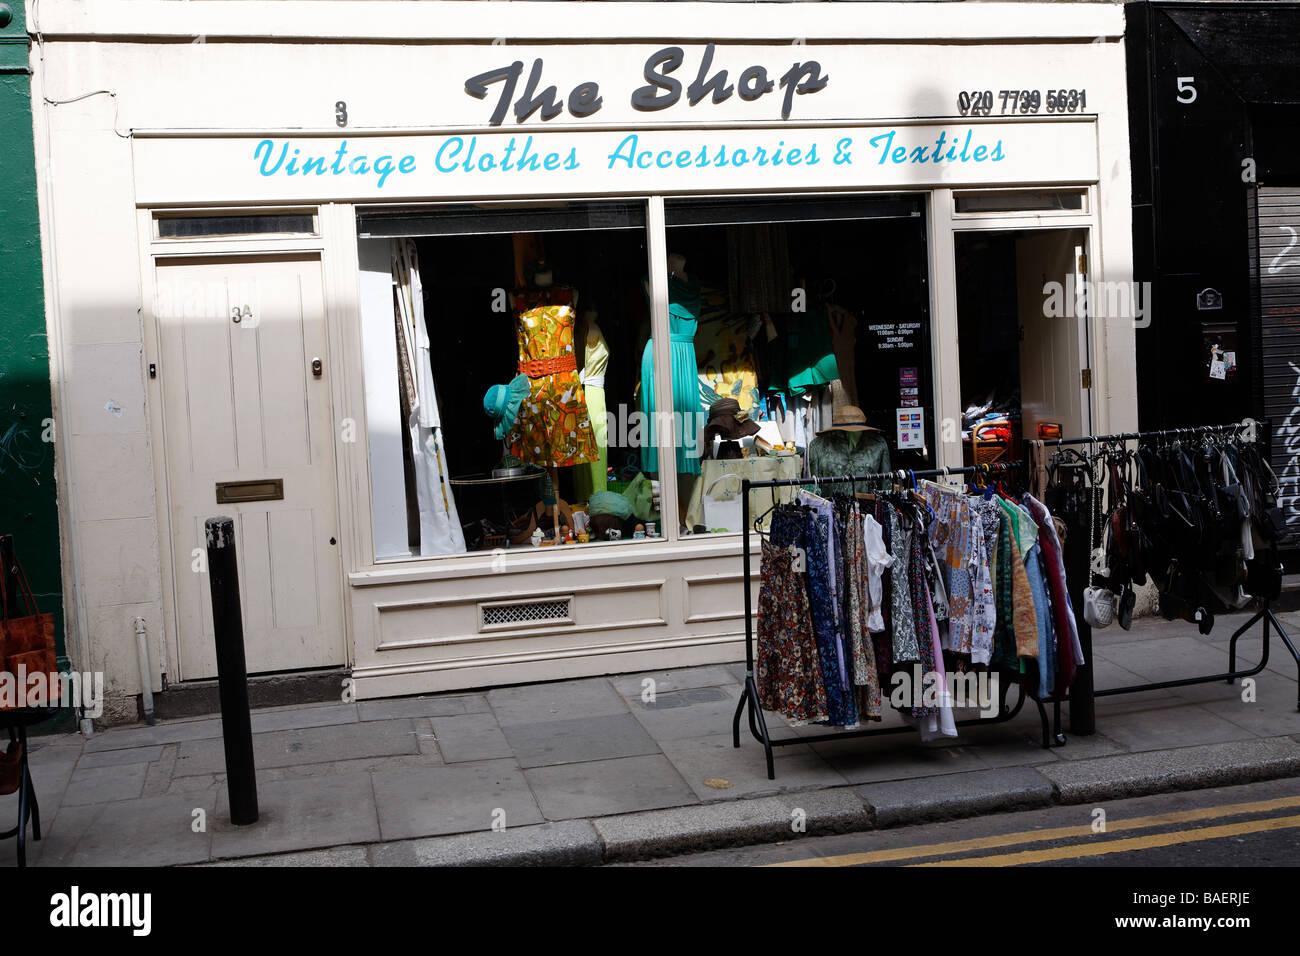 Vintage clothes accesories shop Brick Lane London England - Stock Image